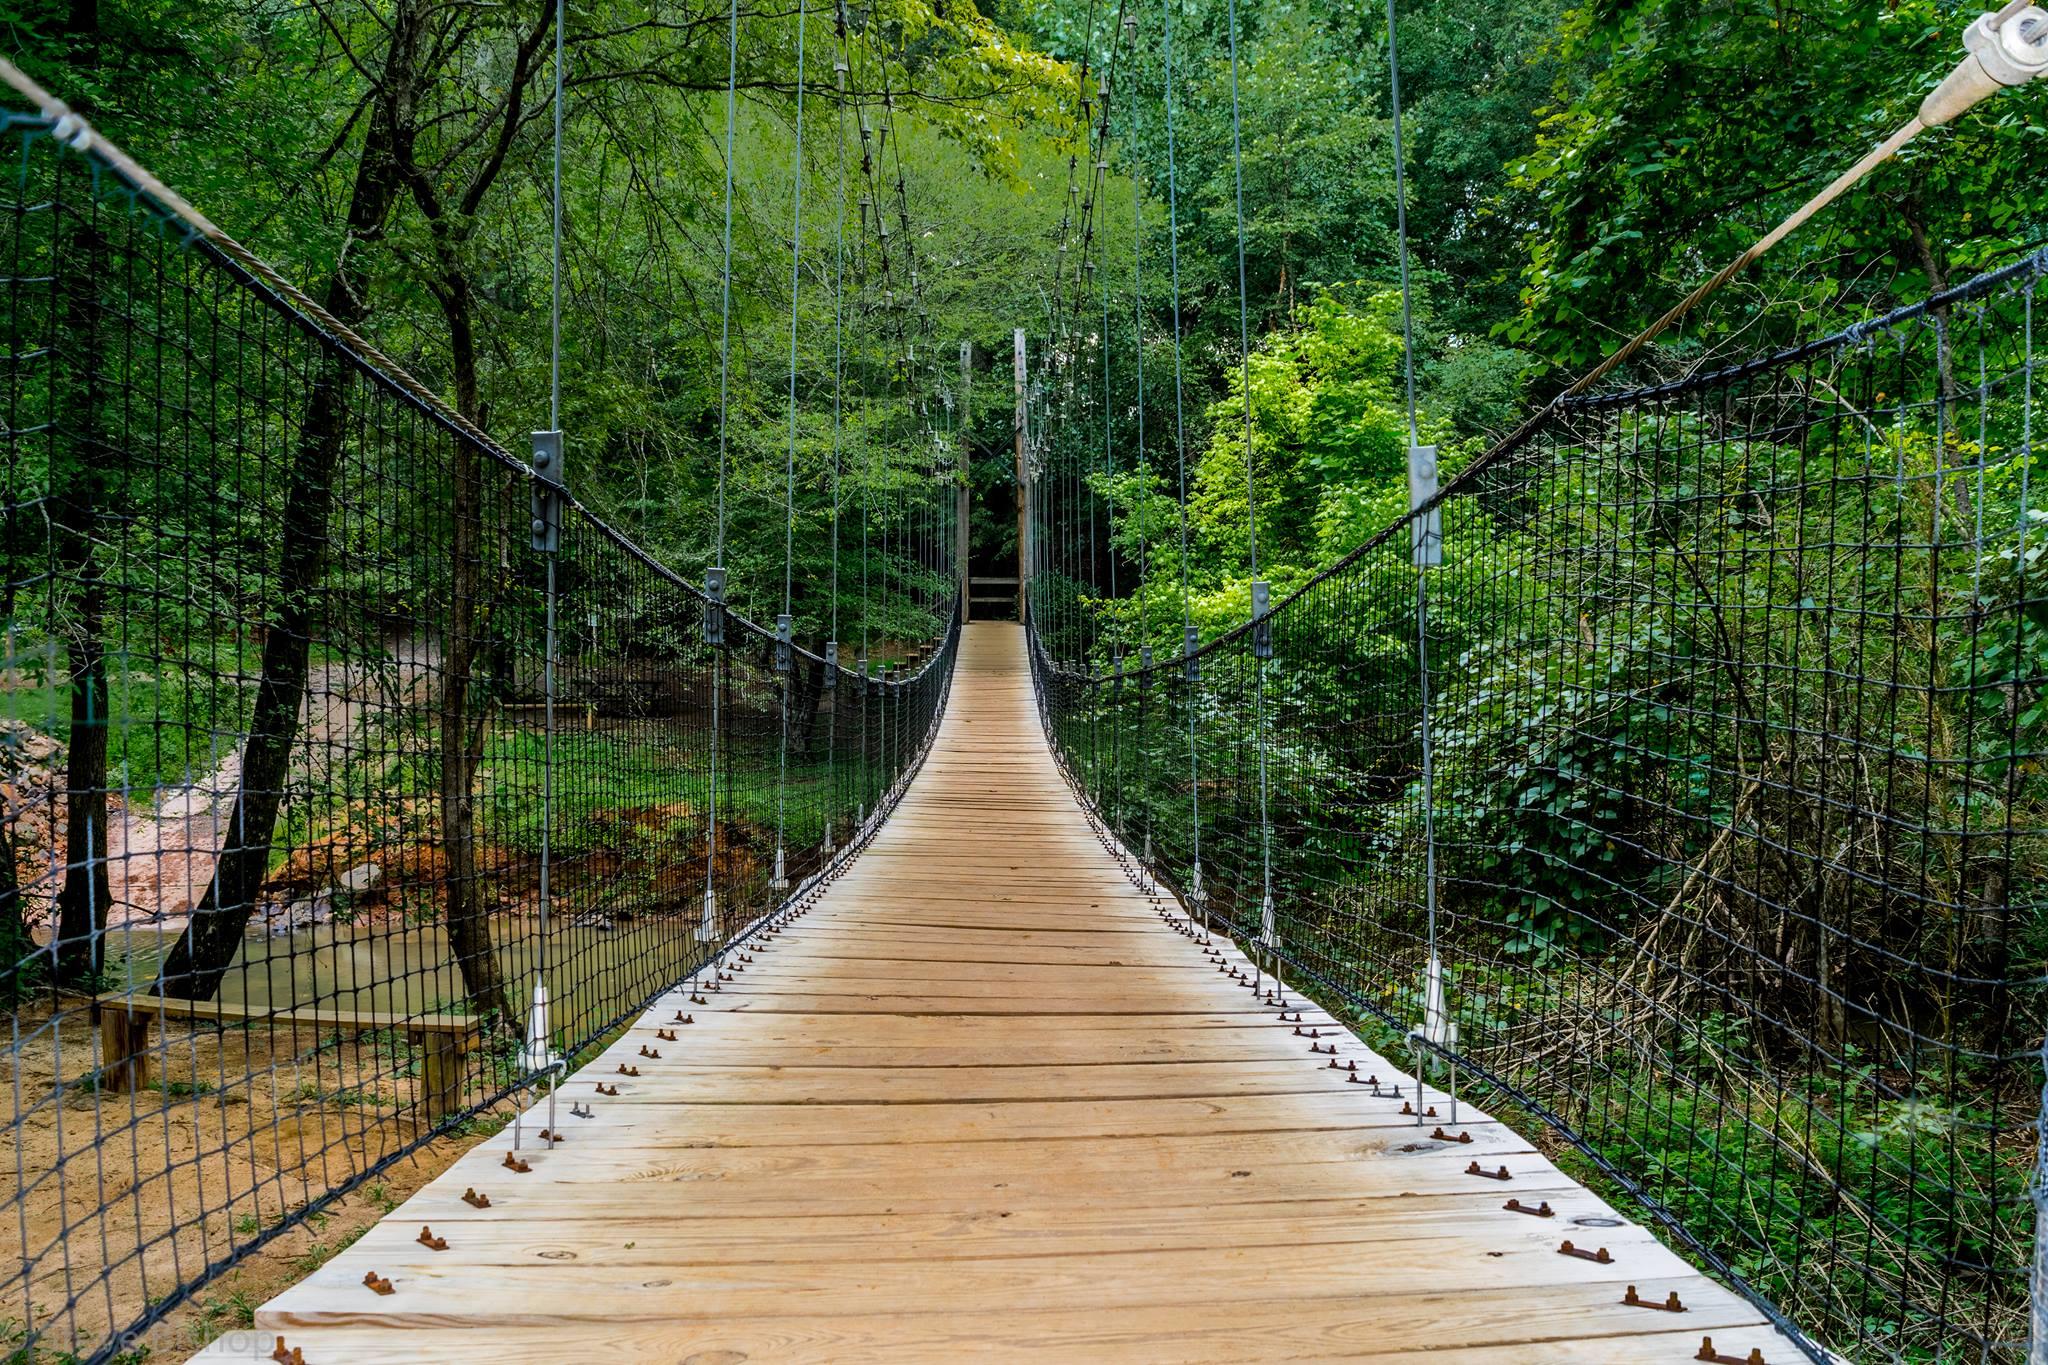 Suspension bridge at Anne Springs Close Greenway